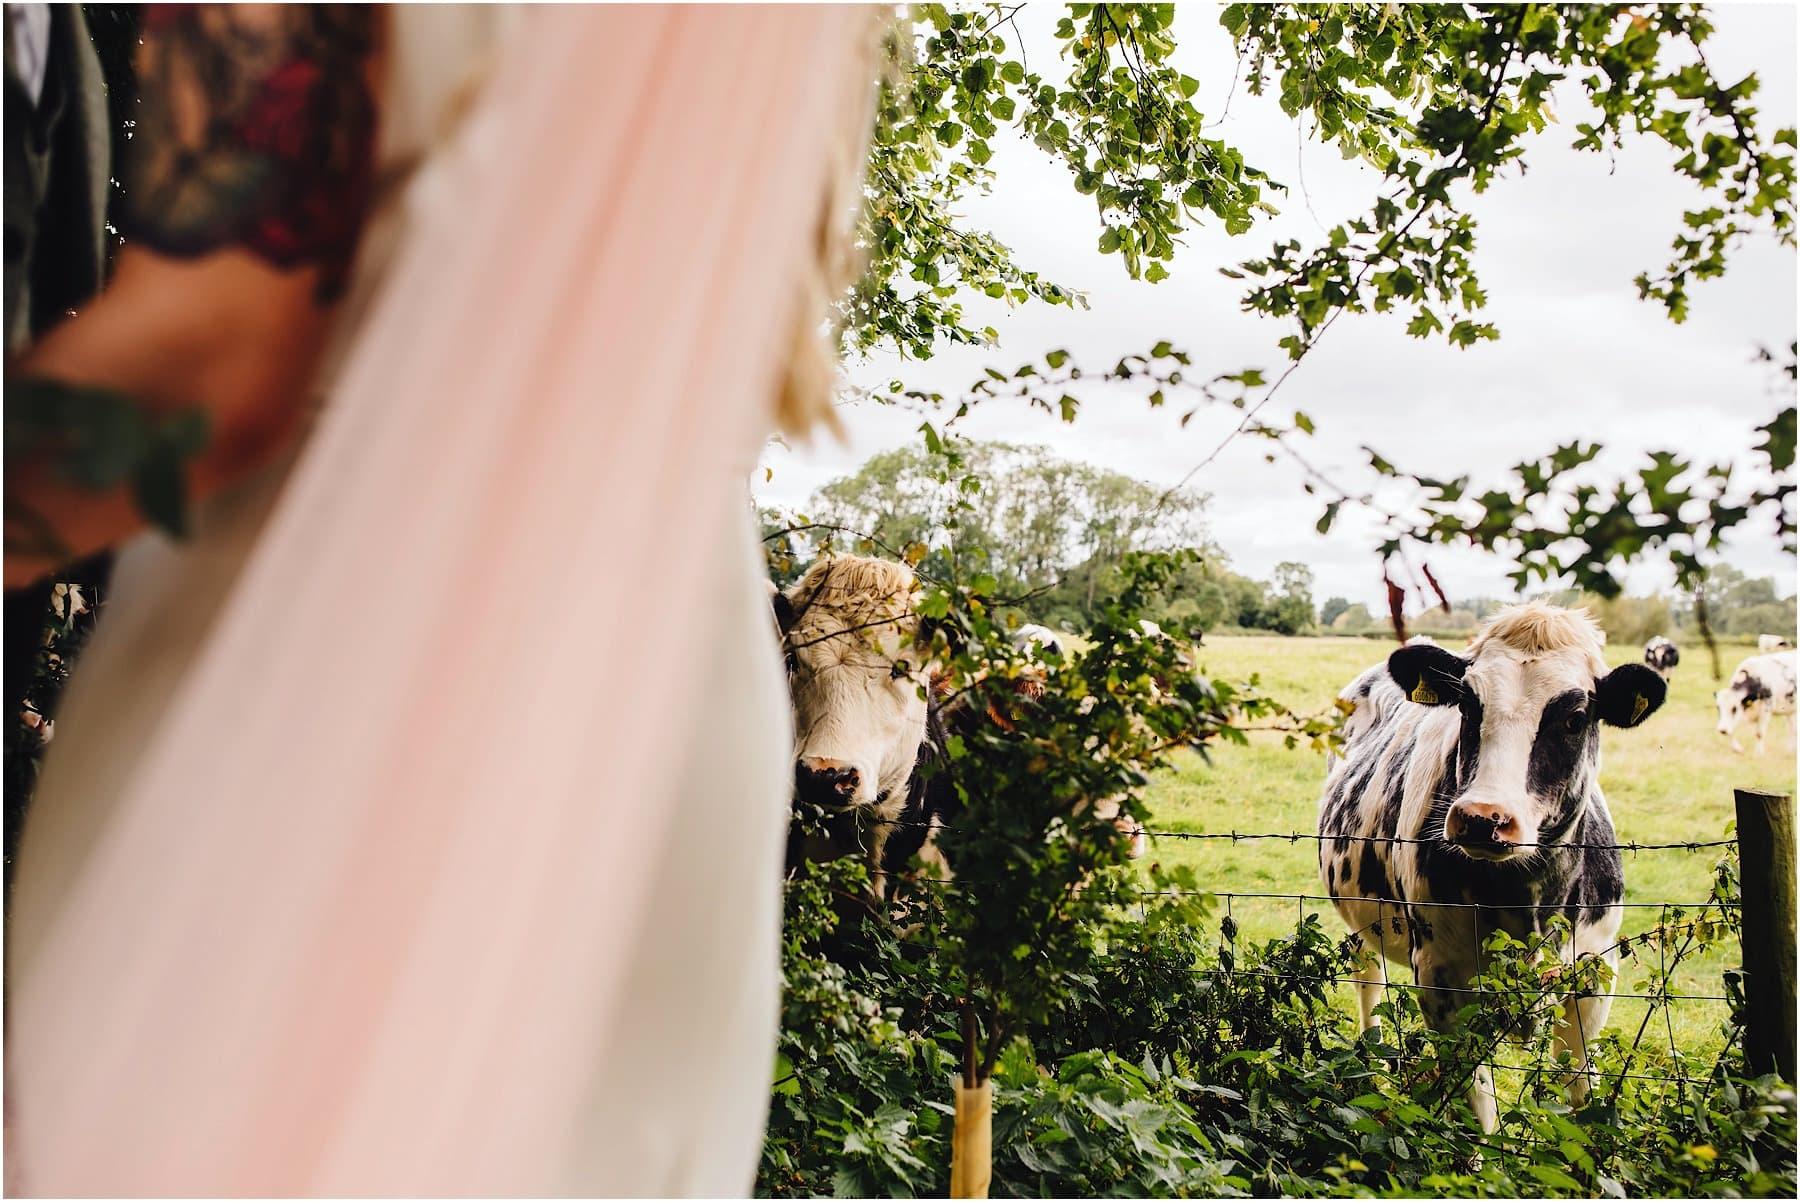 cows watching wedding couple